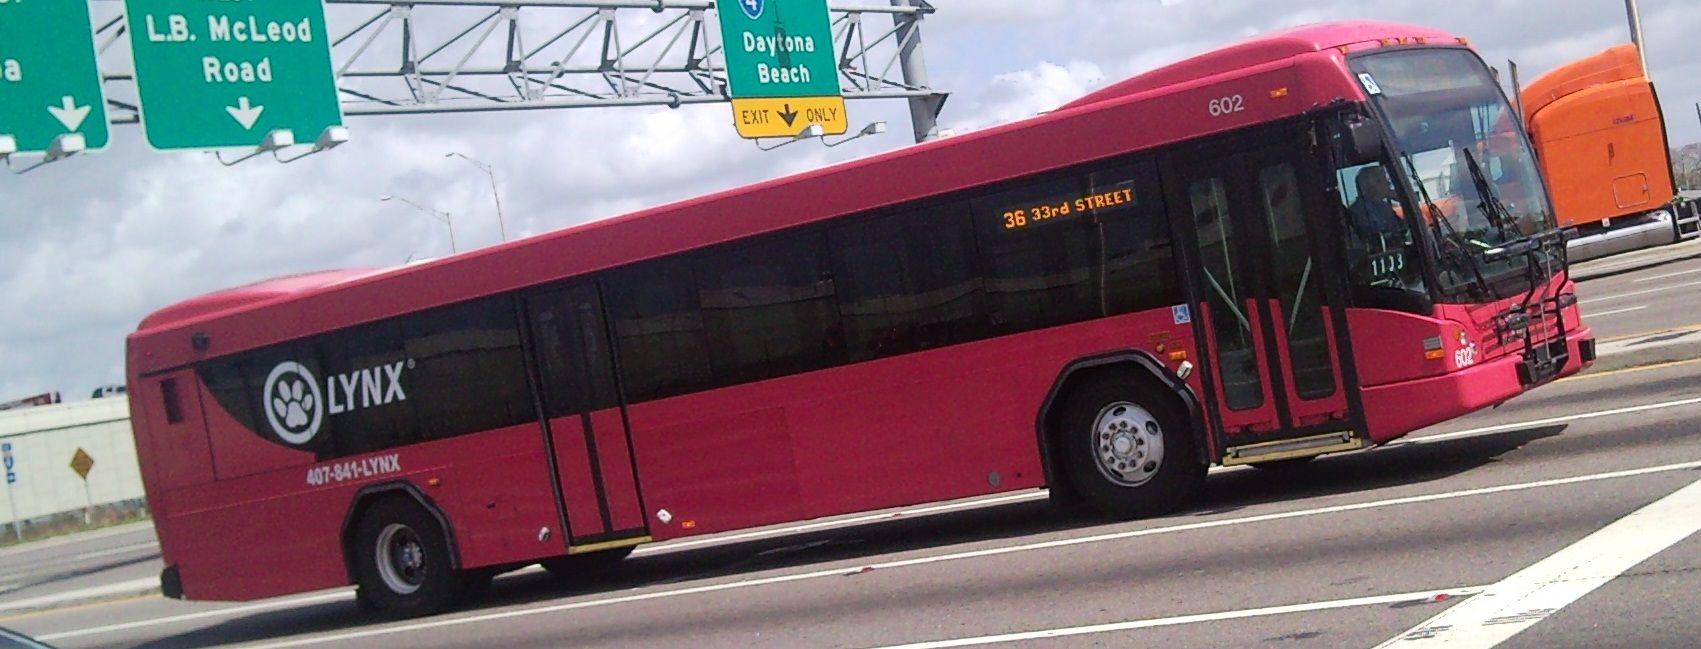 Orlando Lynx Bus